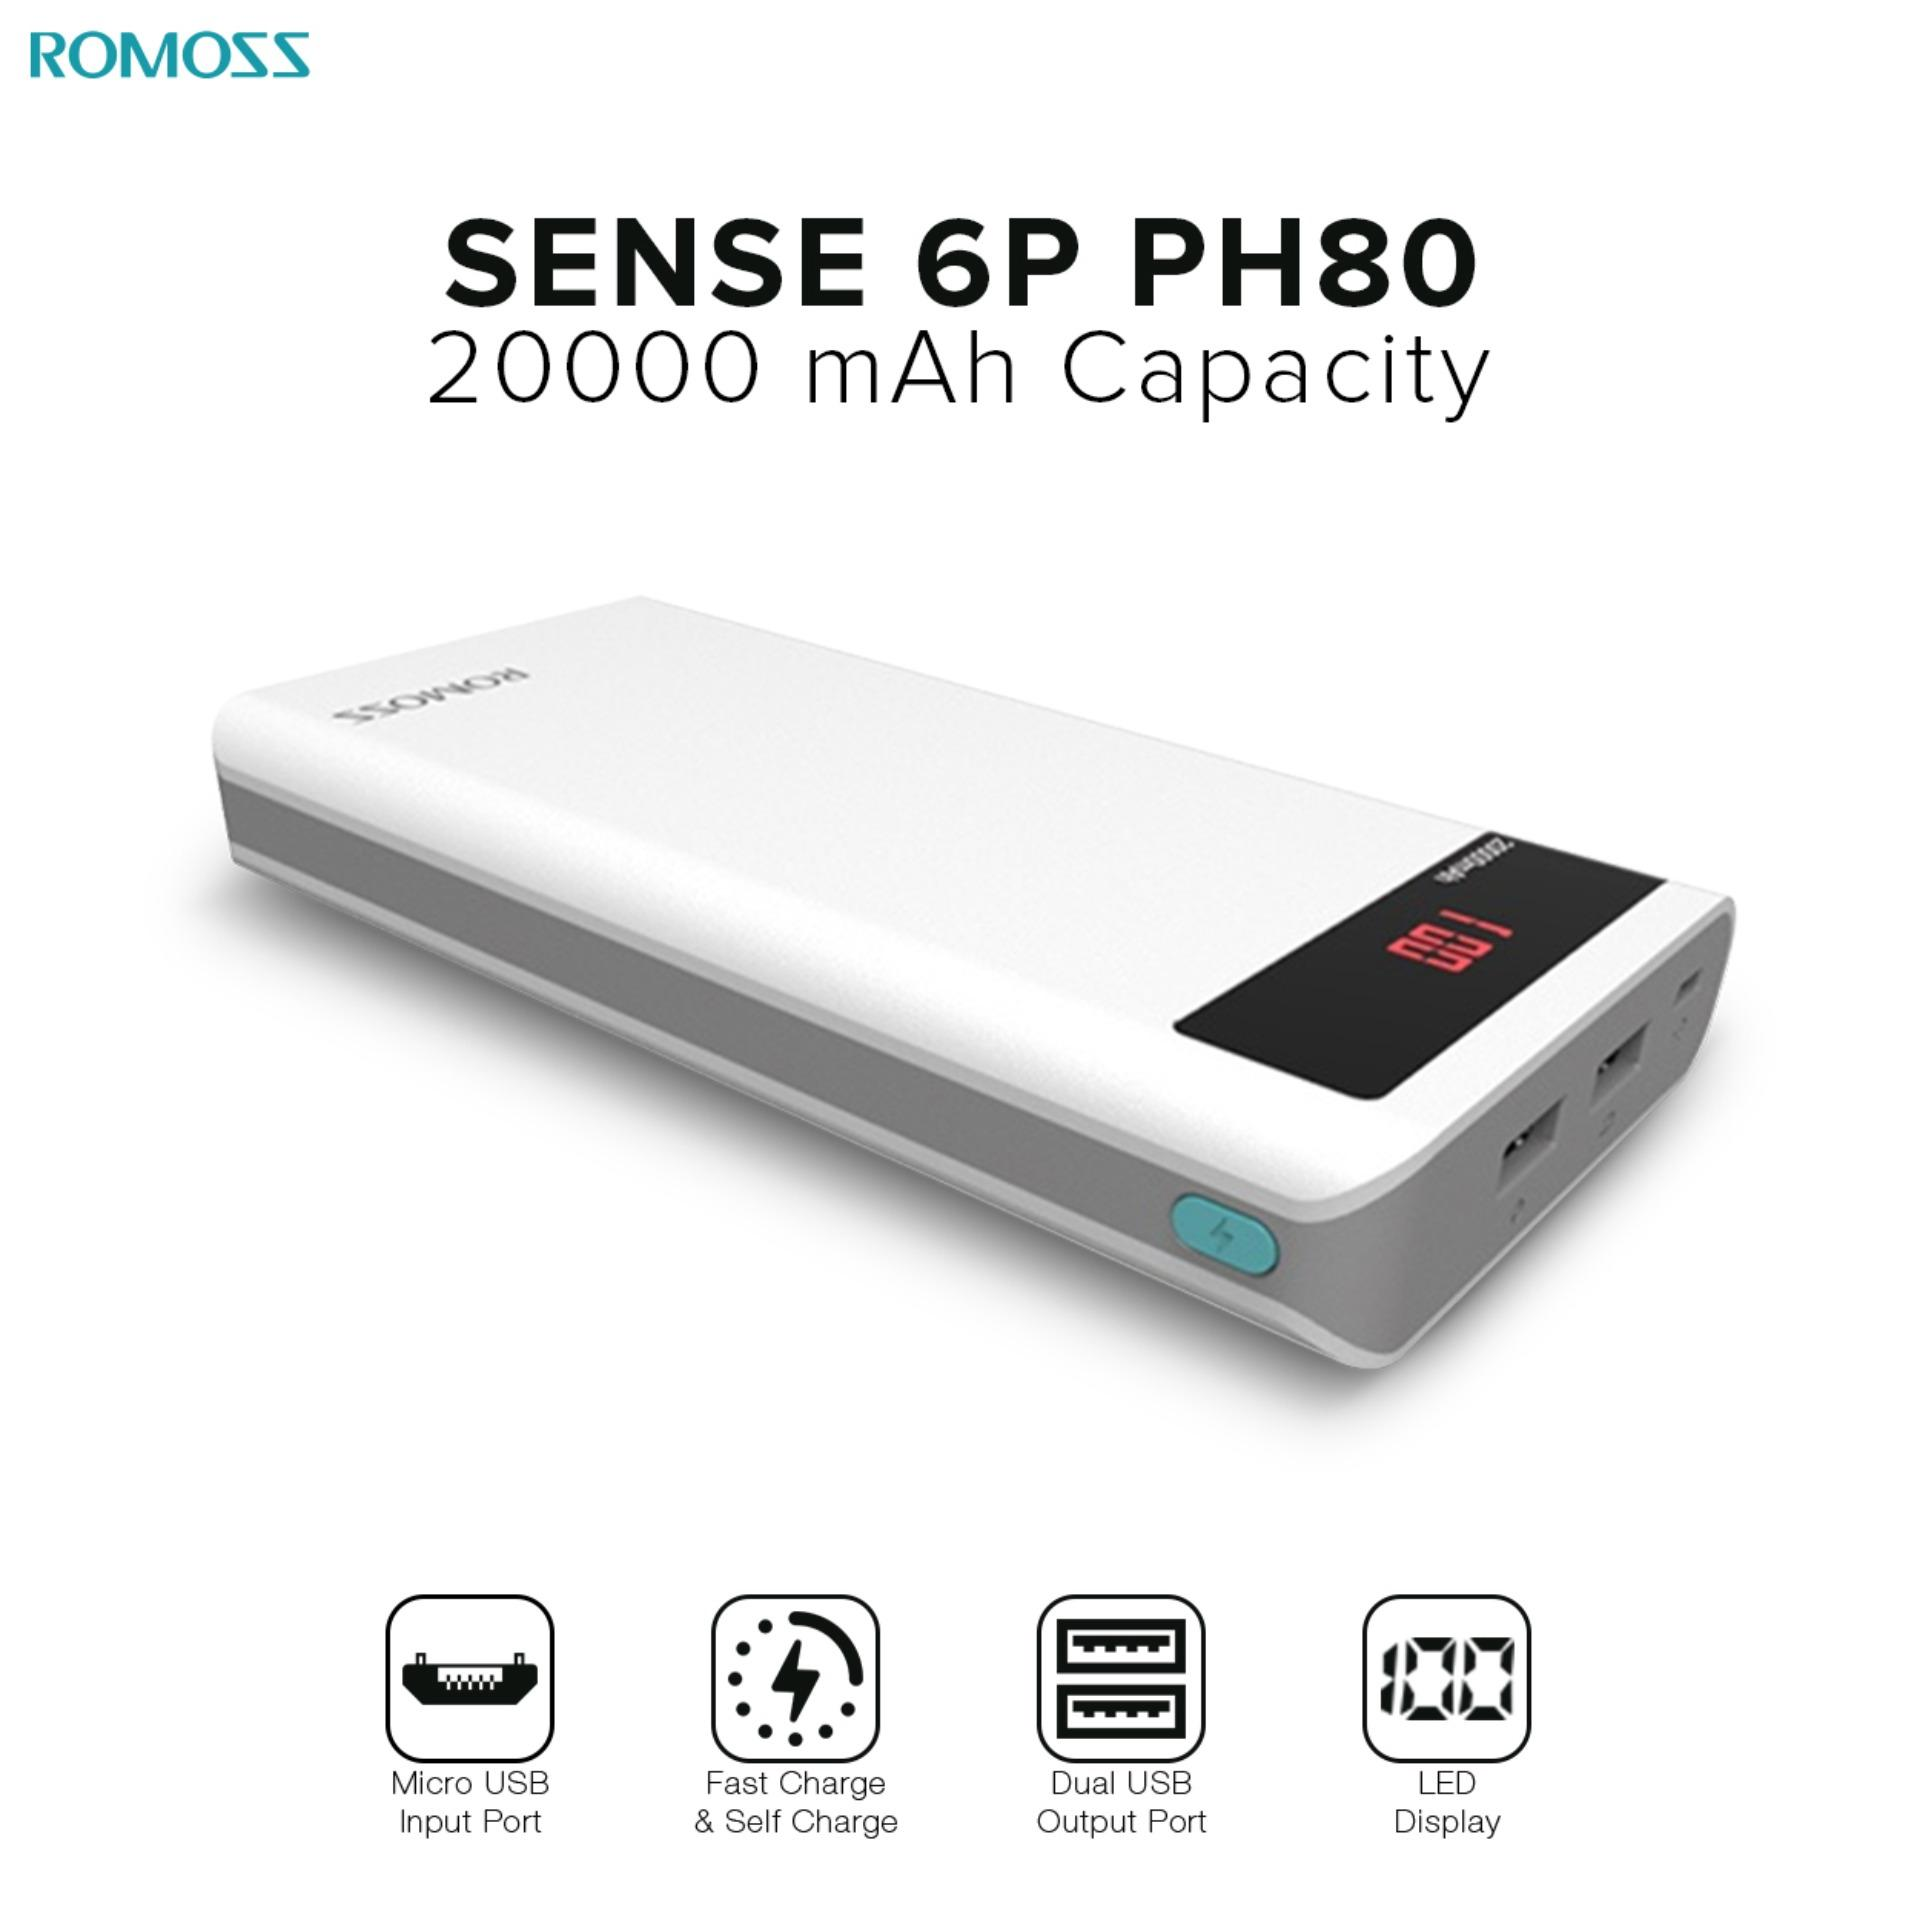 Power Bank For Sale Charger Prices Brands Specs In Xiaomi Mi Powerbank 20000mah Dual Ports Original Romoss Sense 6p Ph80 White